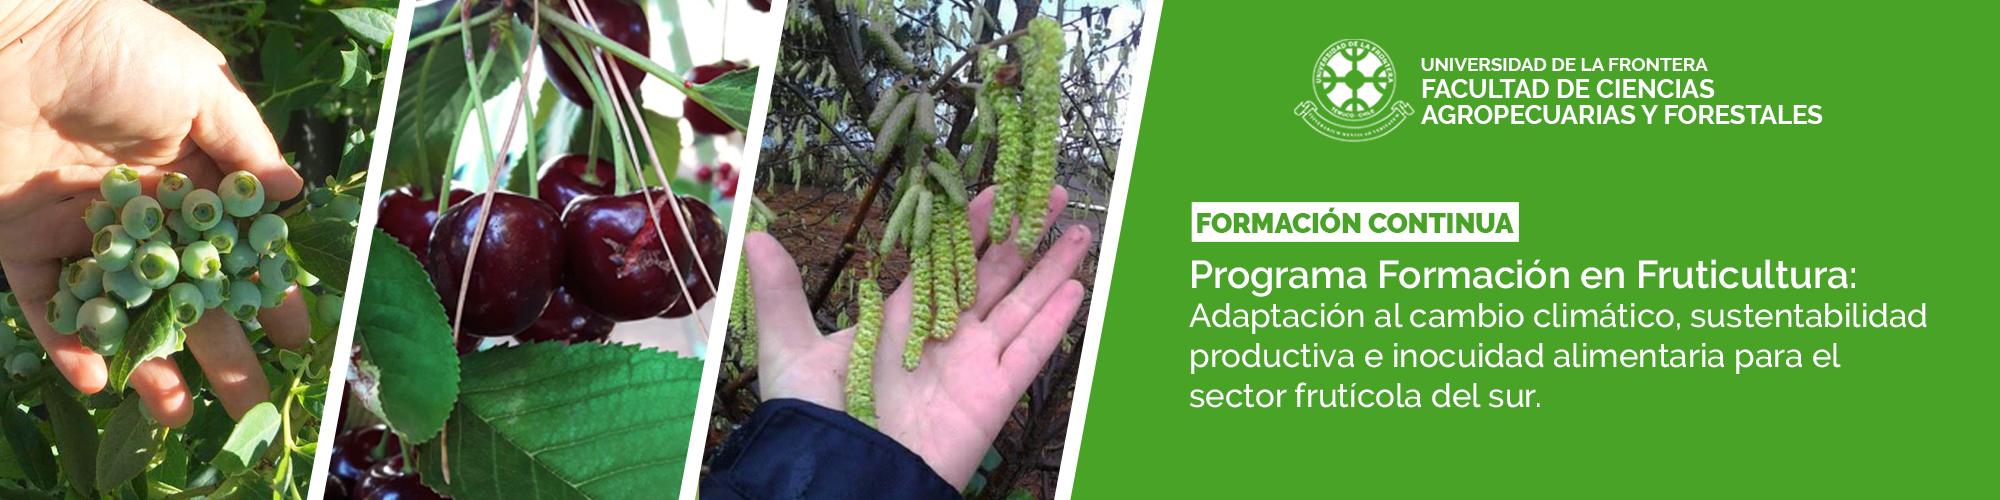 Diplomado en Fruticultura